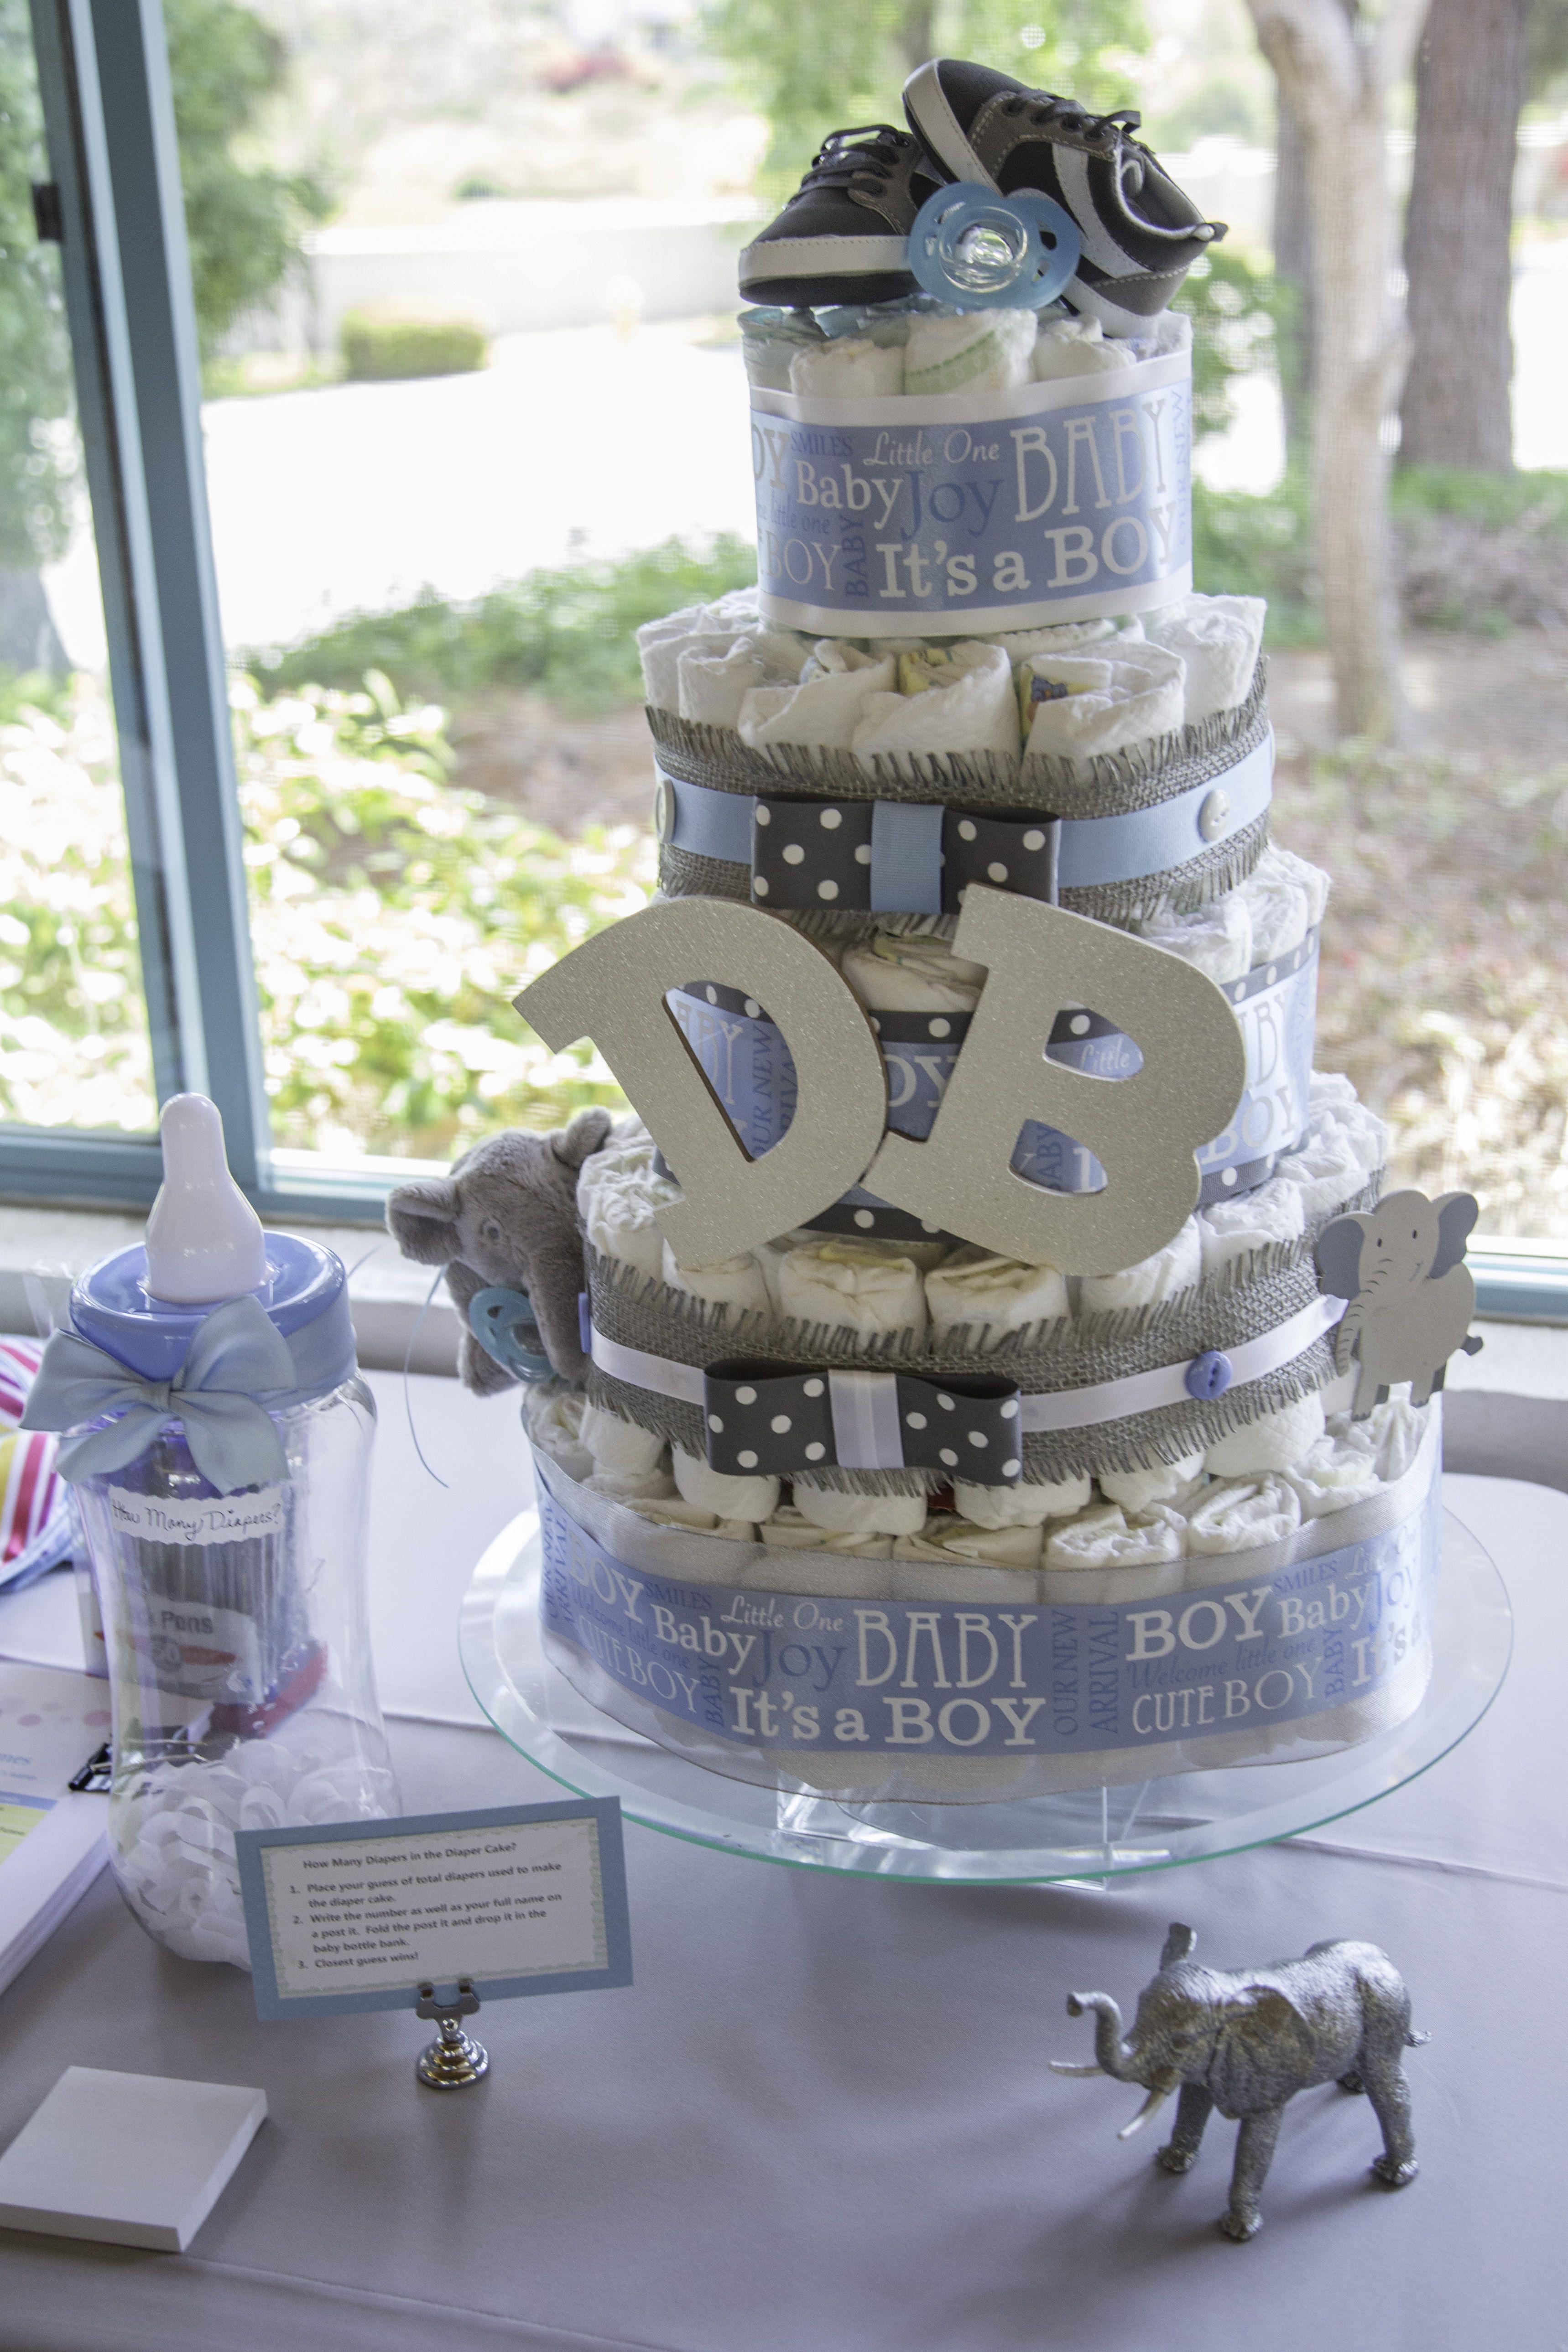 Diaper cake for a baby boy elephant theme blue and grey diaper cake for a baby boy elephant theme blue and grey diapercake negle Gallery